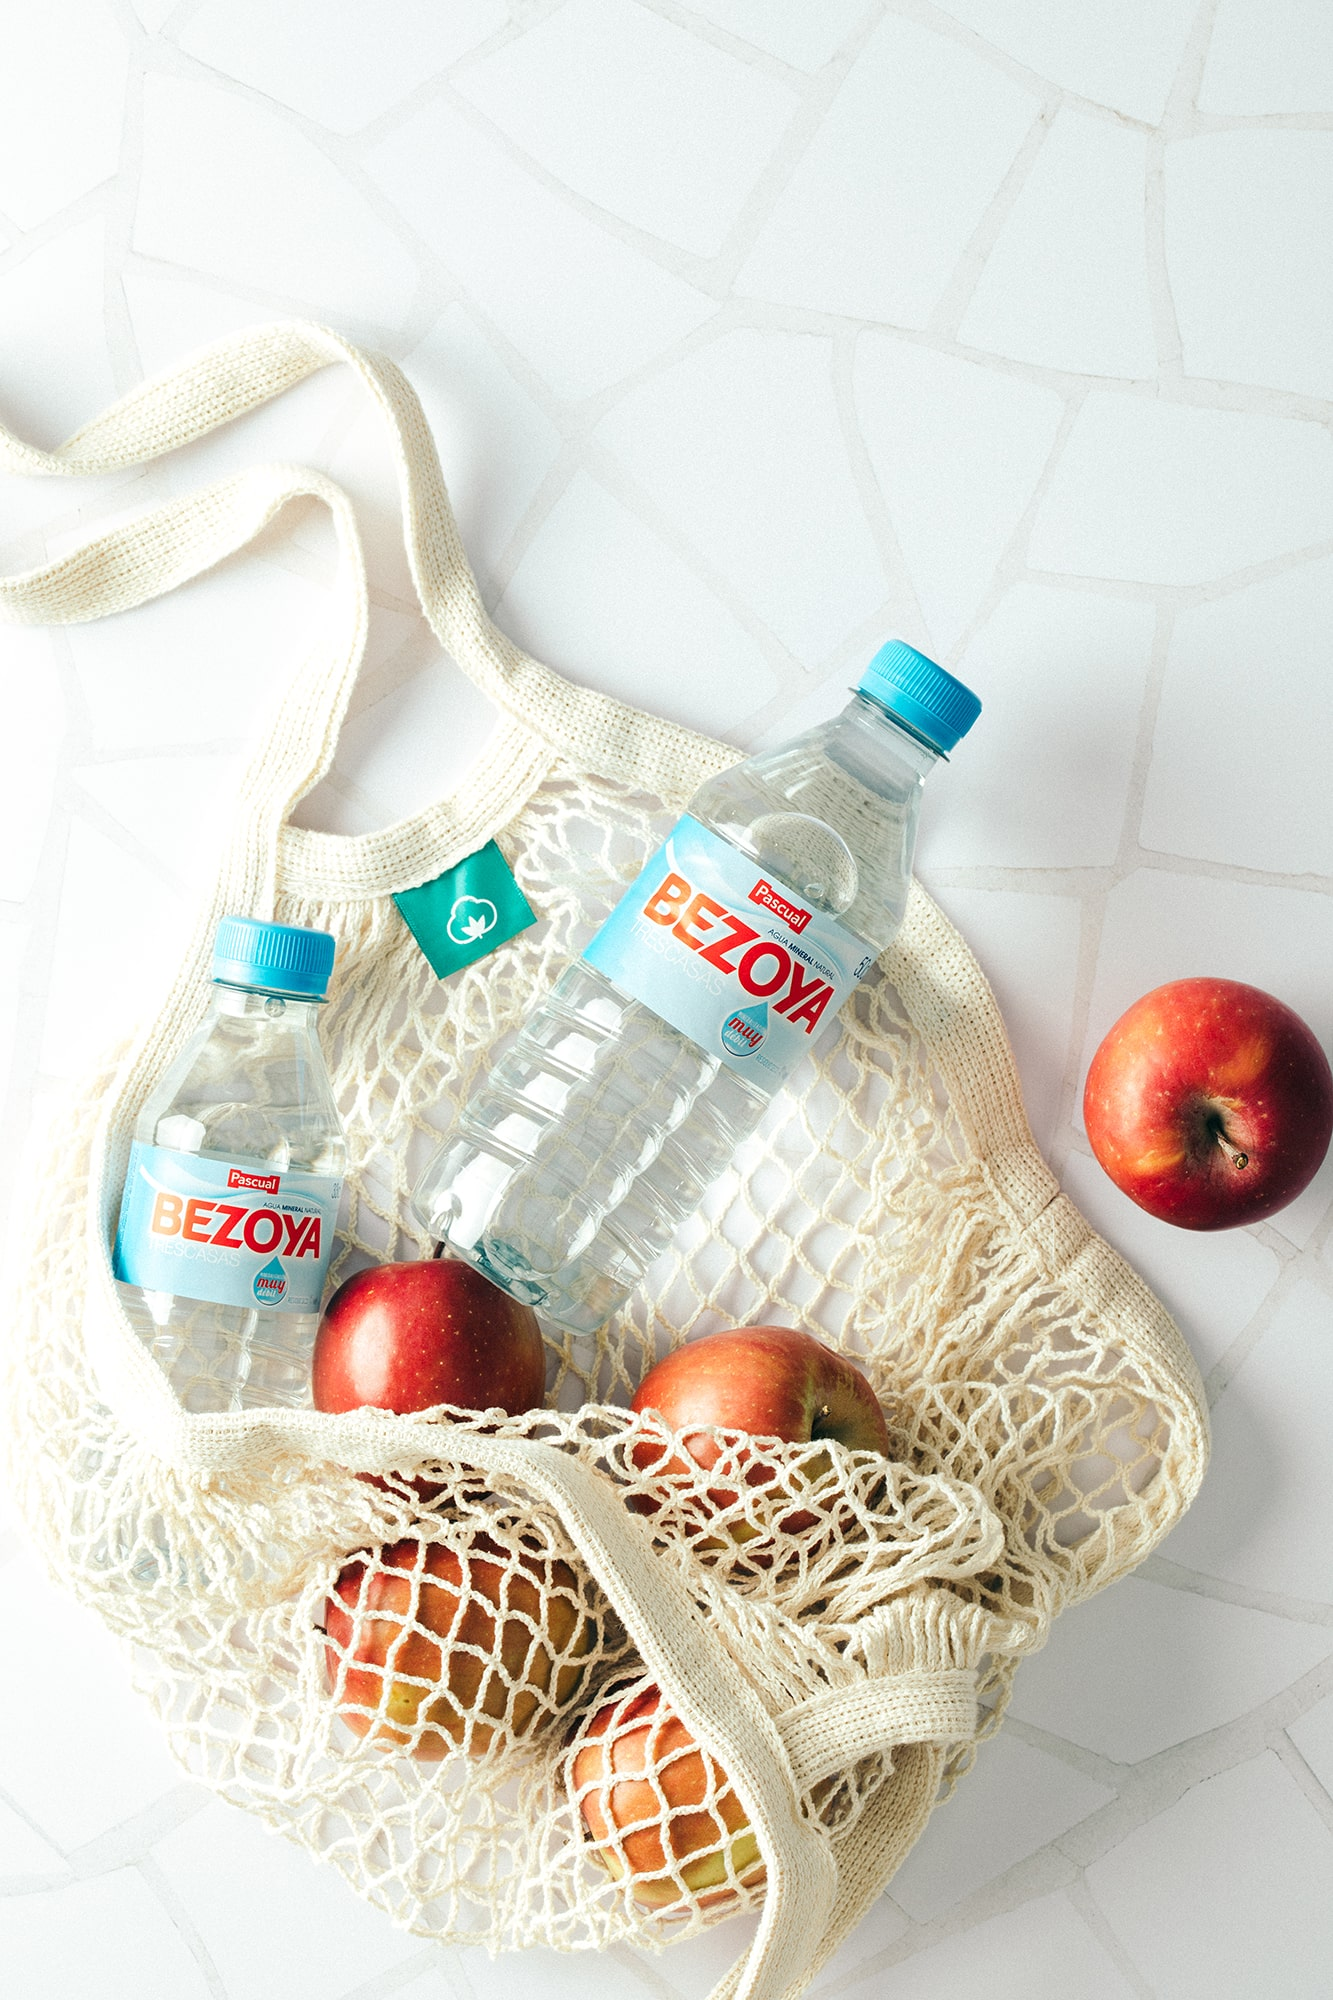 botellas Bezoya